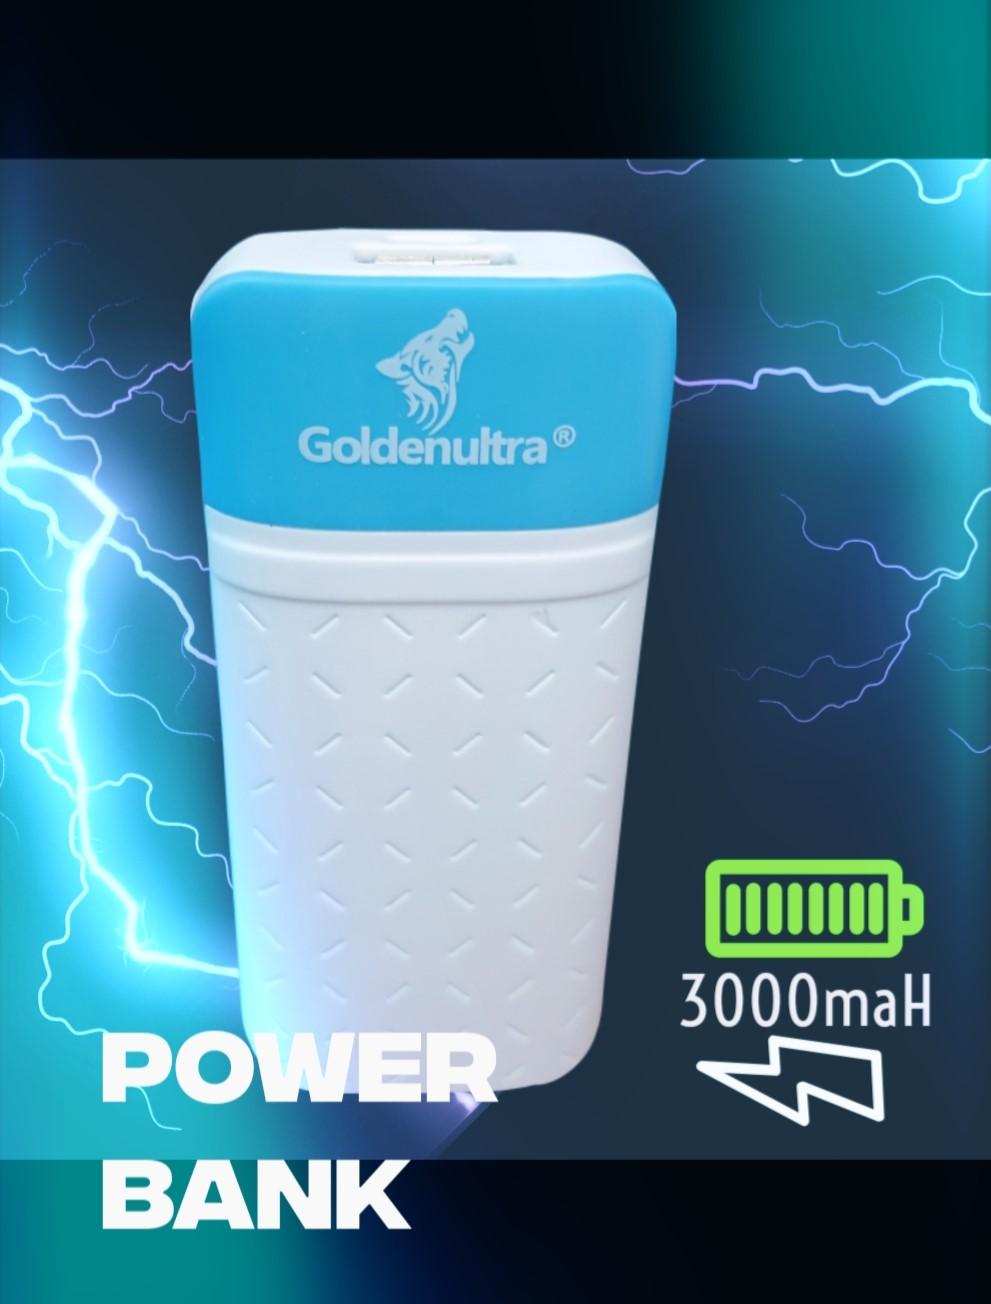 Power Bank - Carregador Portátil 3000maH